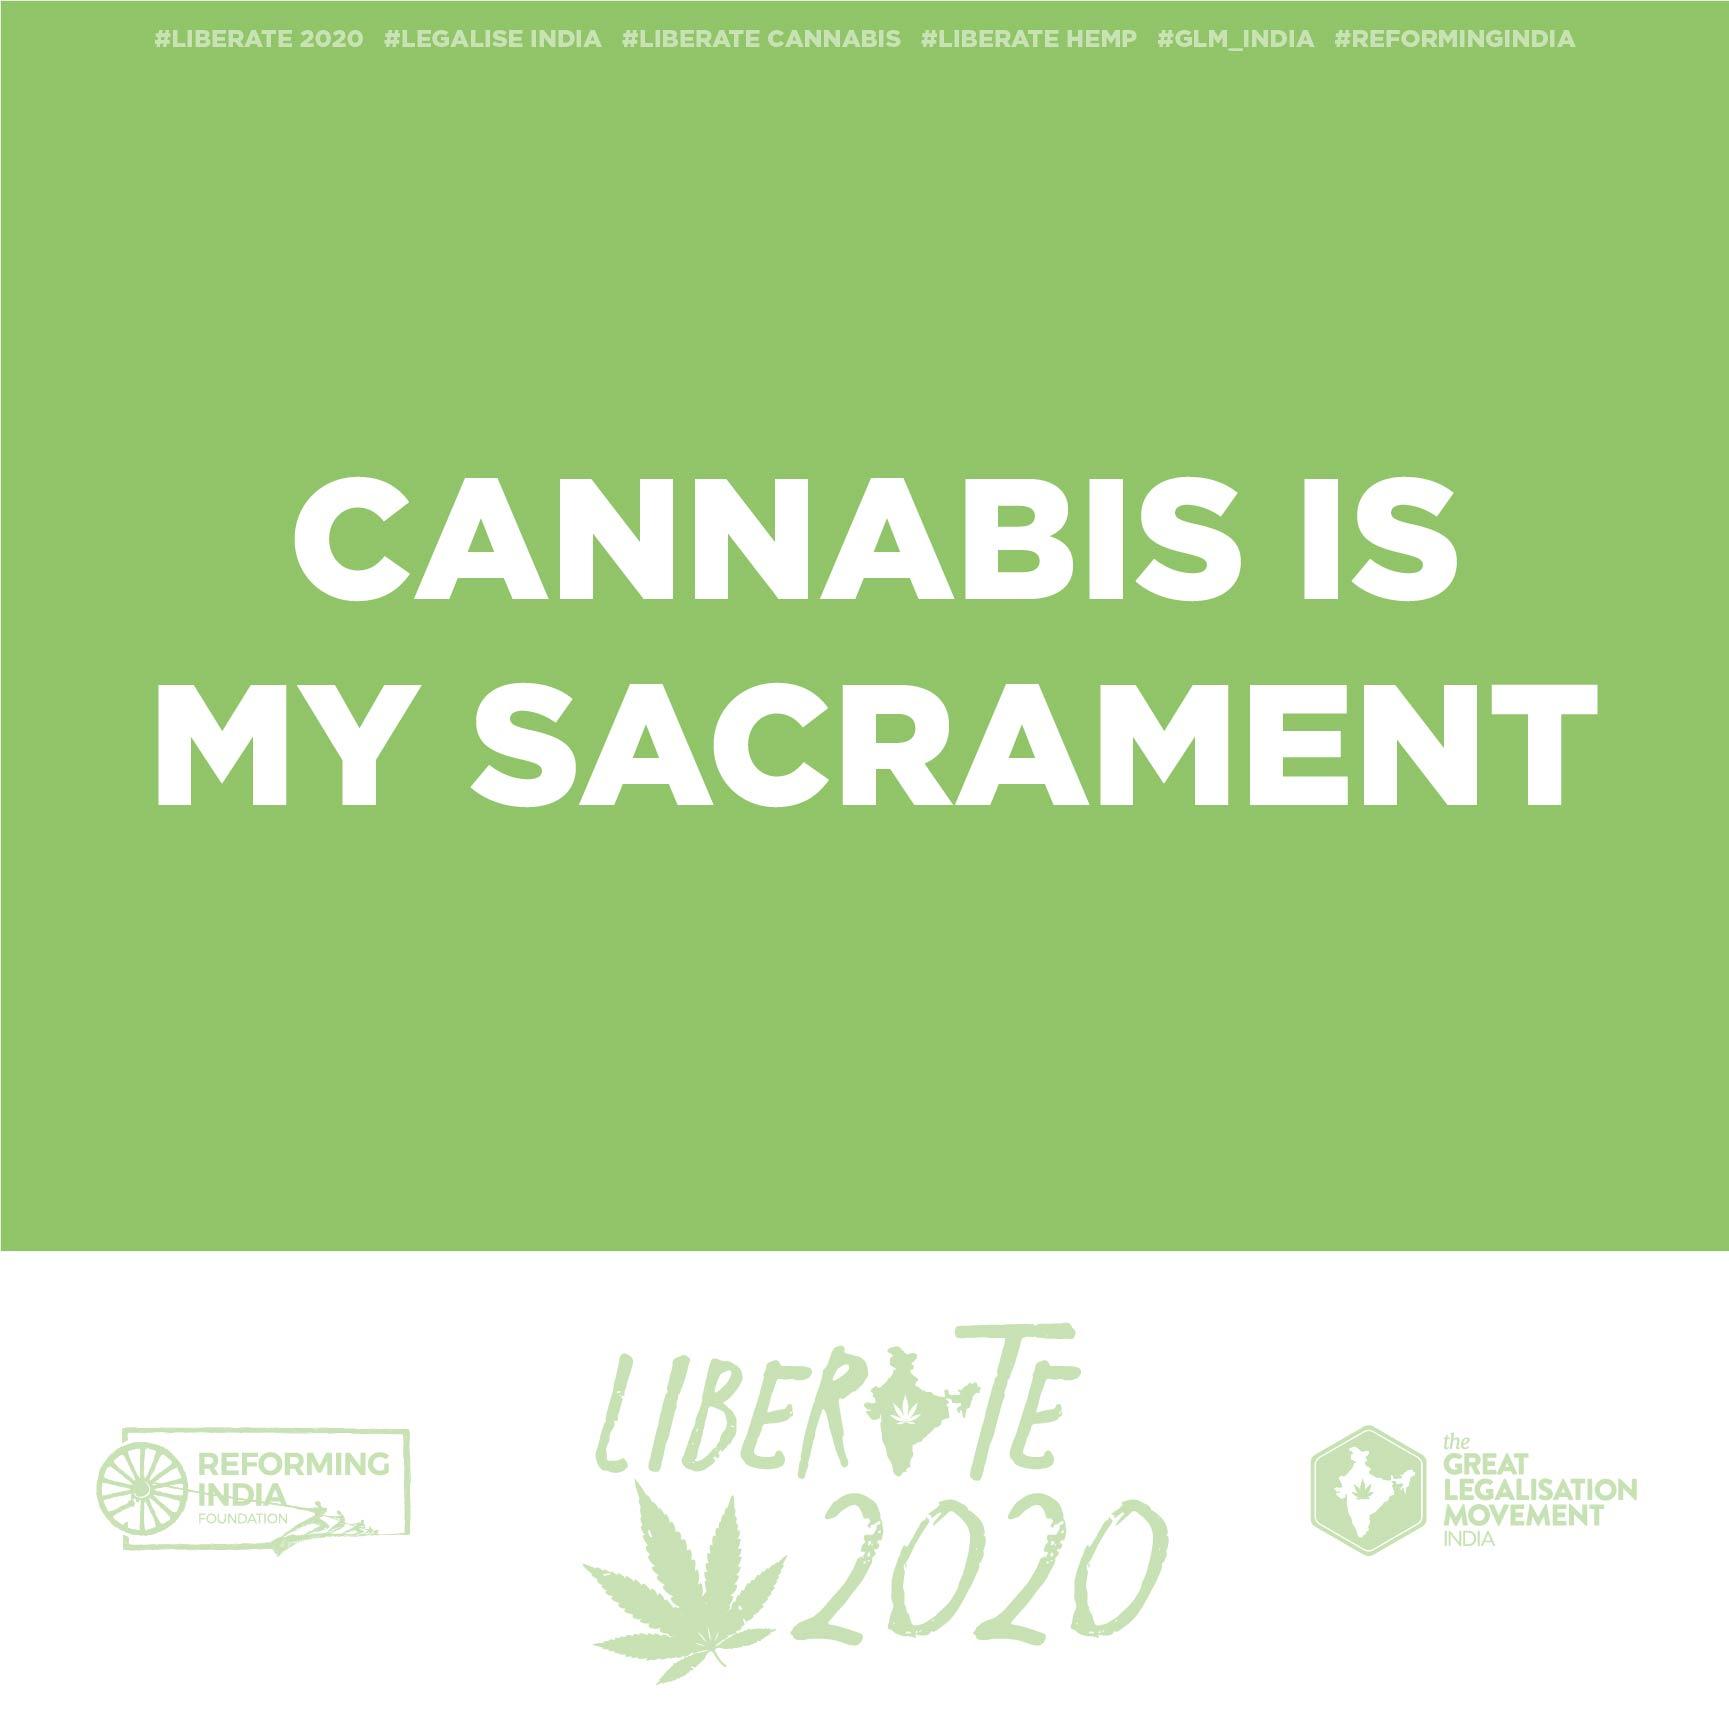 cannabisArtboard 1 copy 4-50.jpg